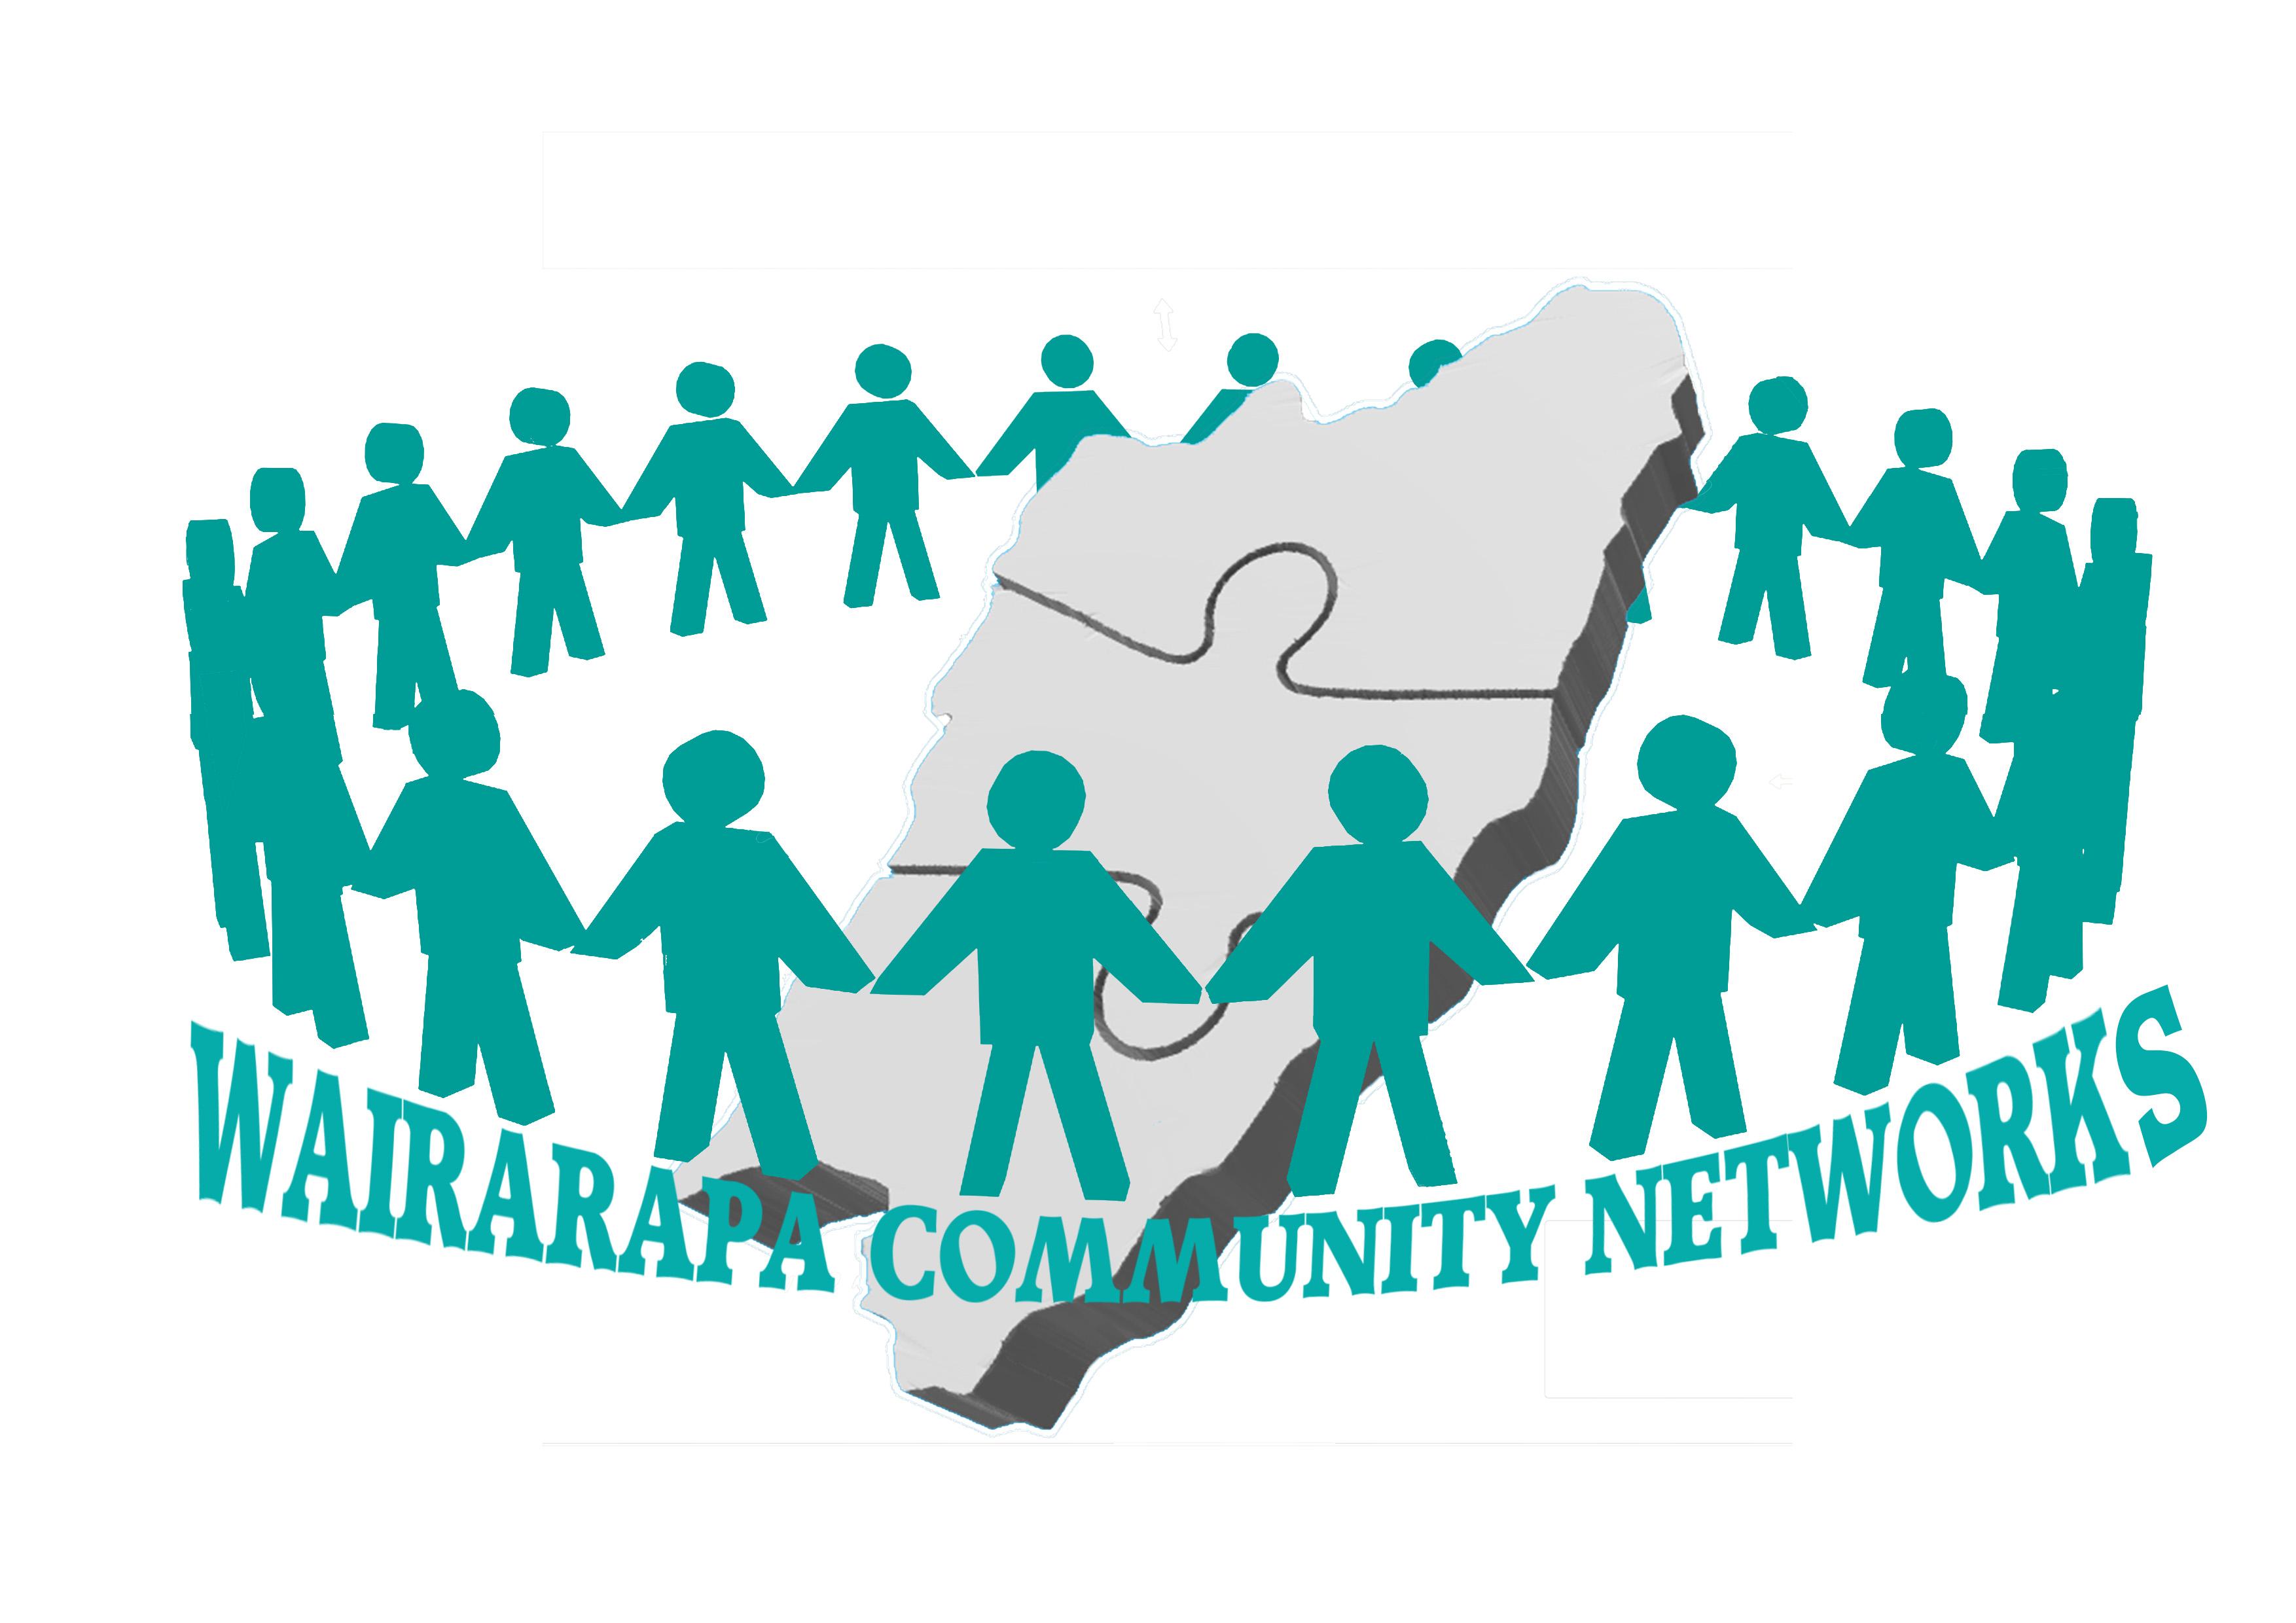 Wai Community Networks